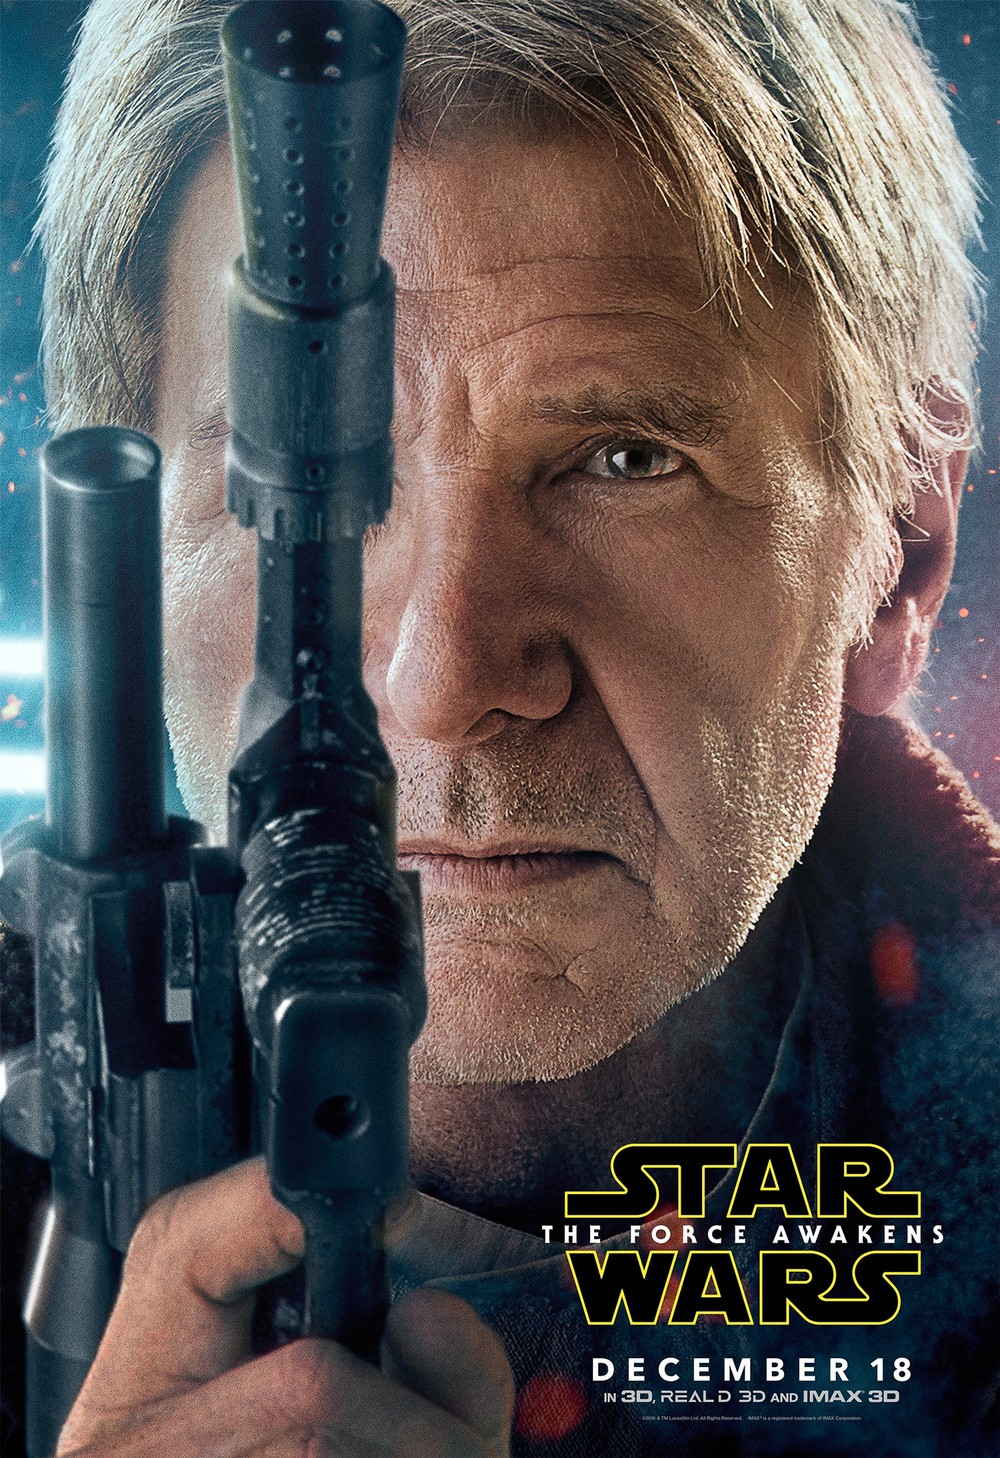 Star Wars 7 Rekord